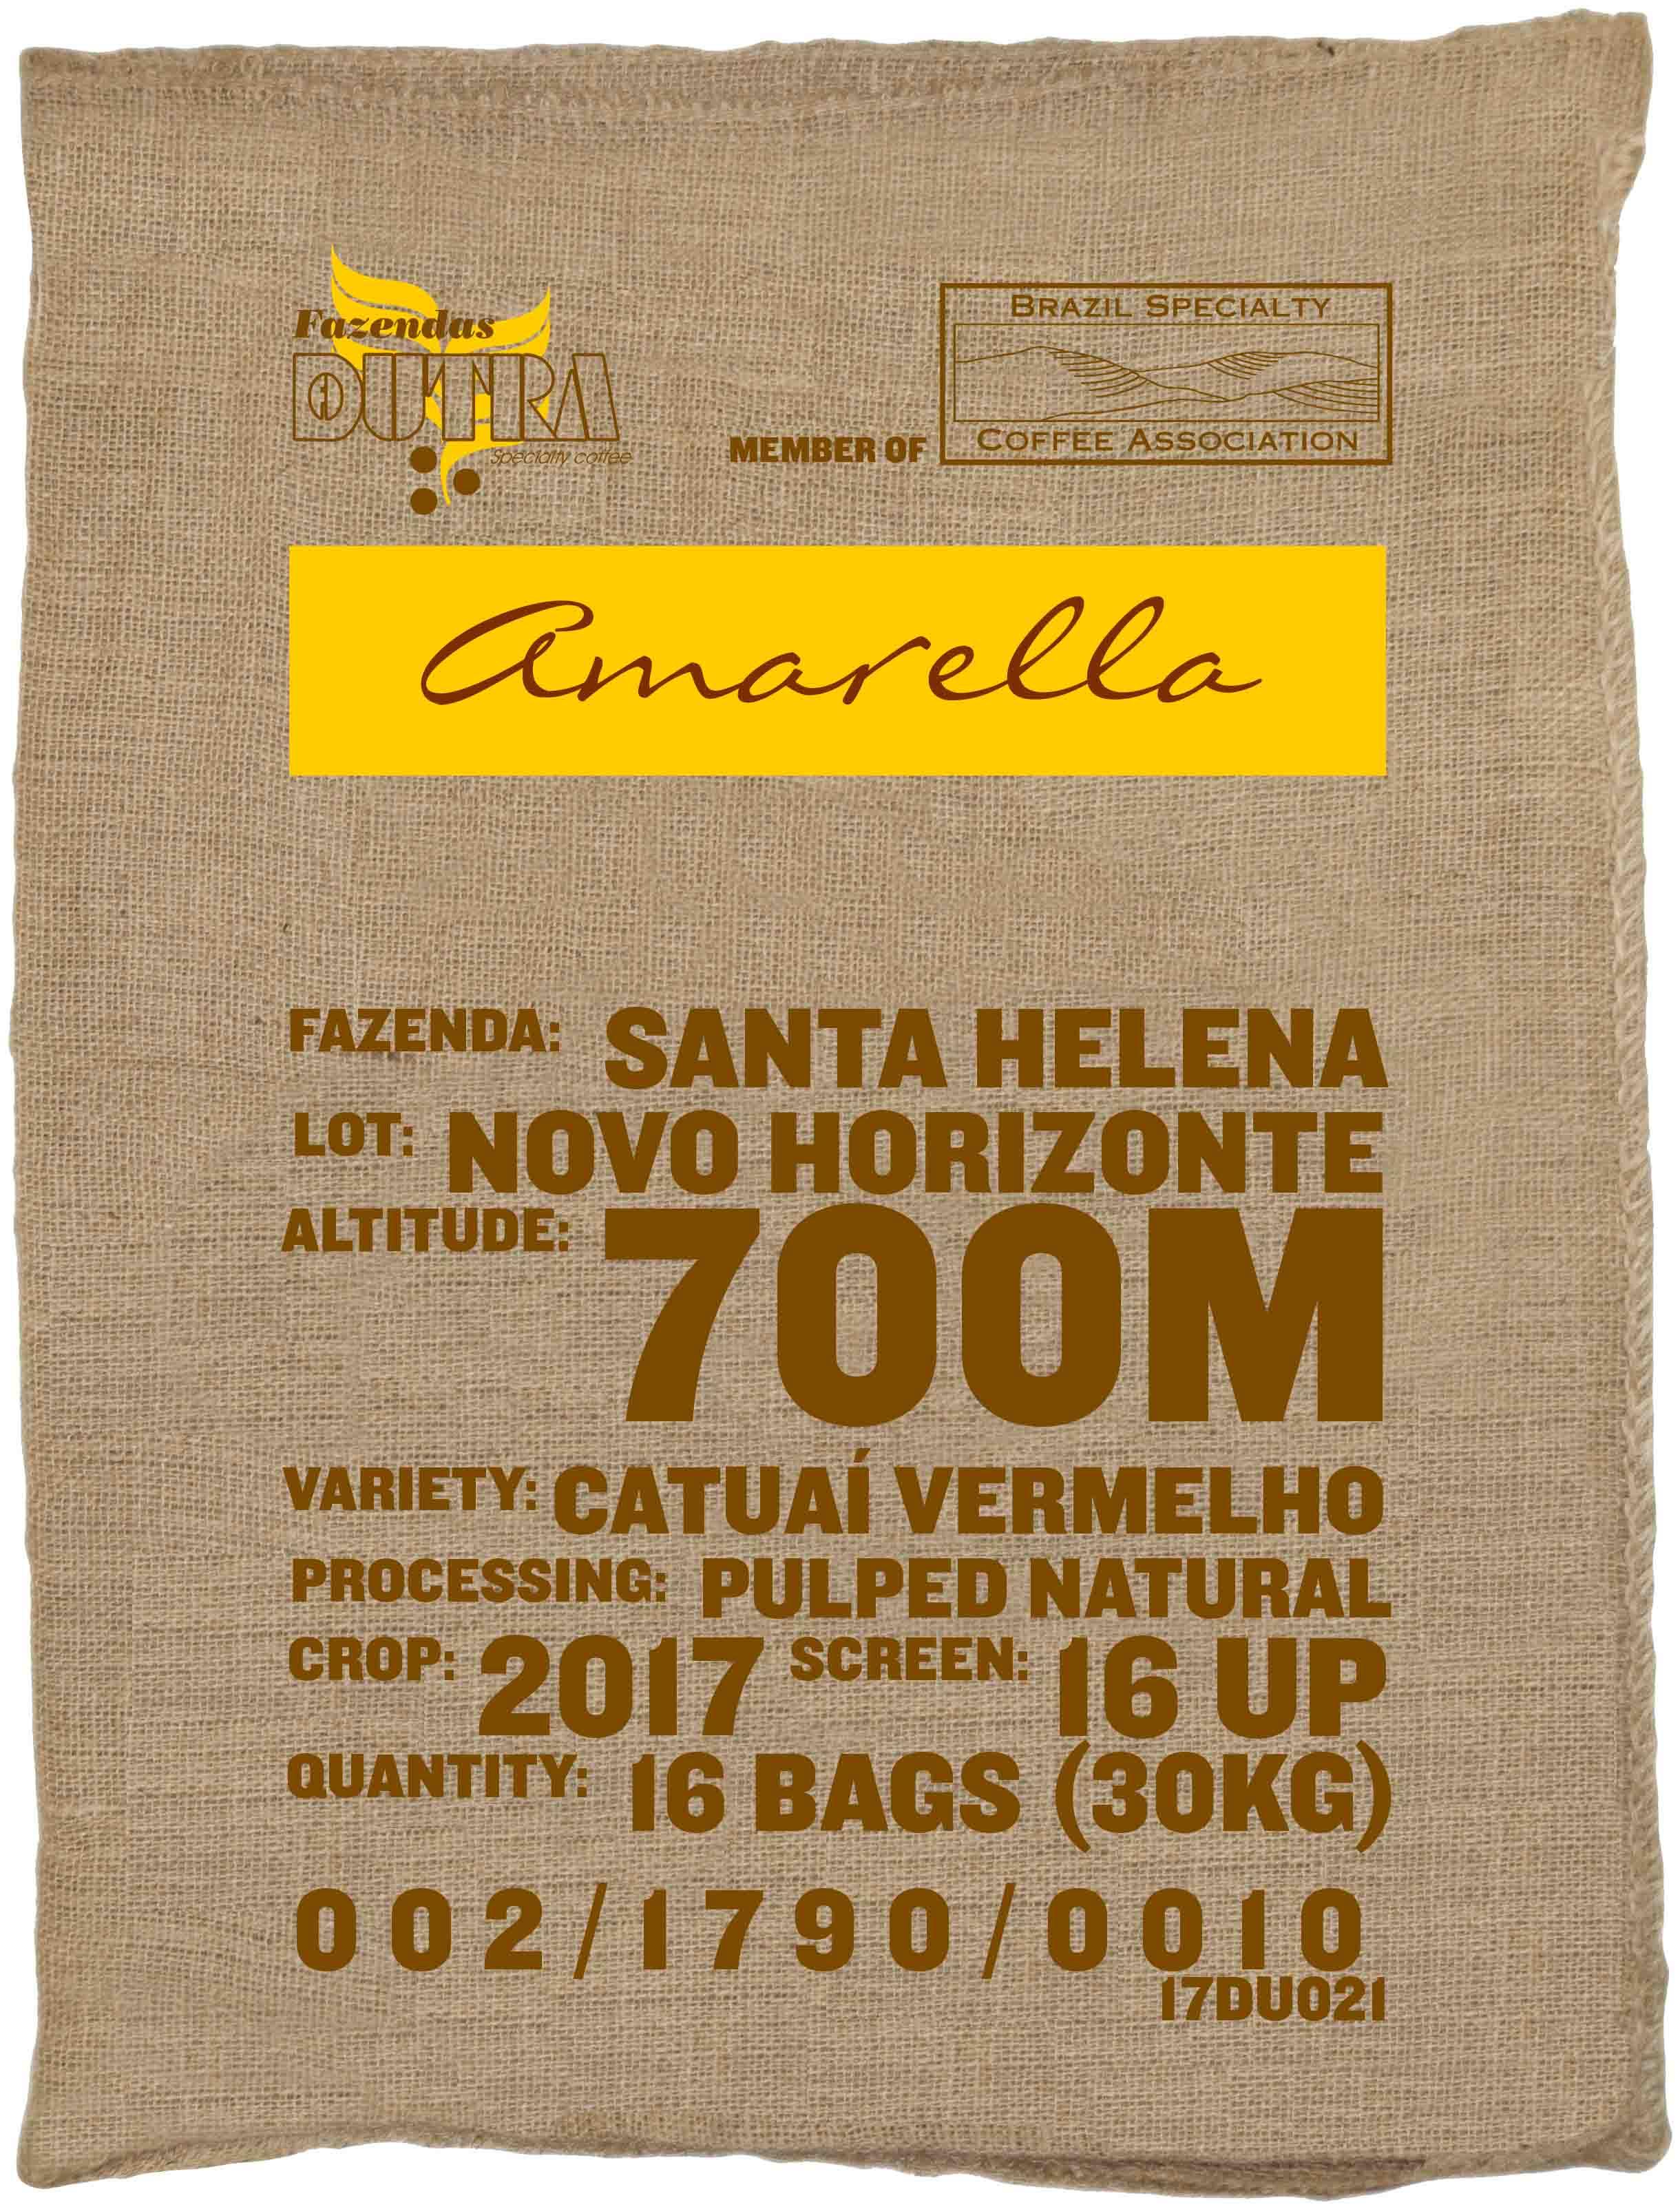 Ein Rohkaffeesack amarella Parzellenkaffee Varietät Catuai vermelho. Fazendas Dutra Lot Novo Horizonte.